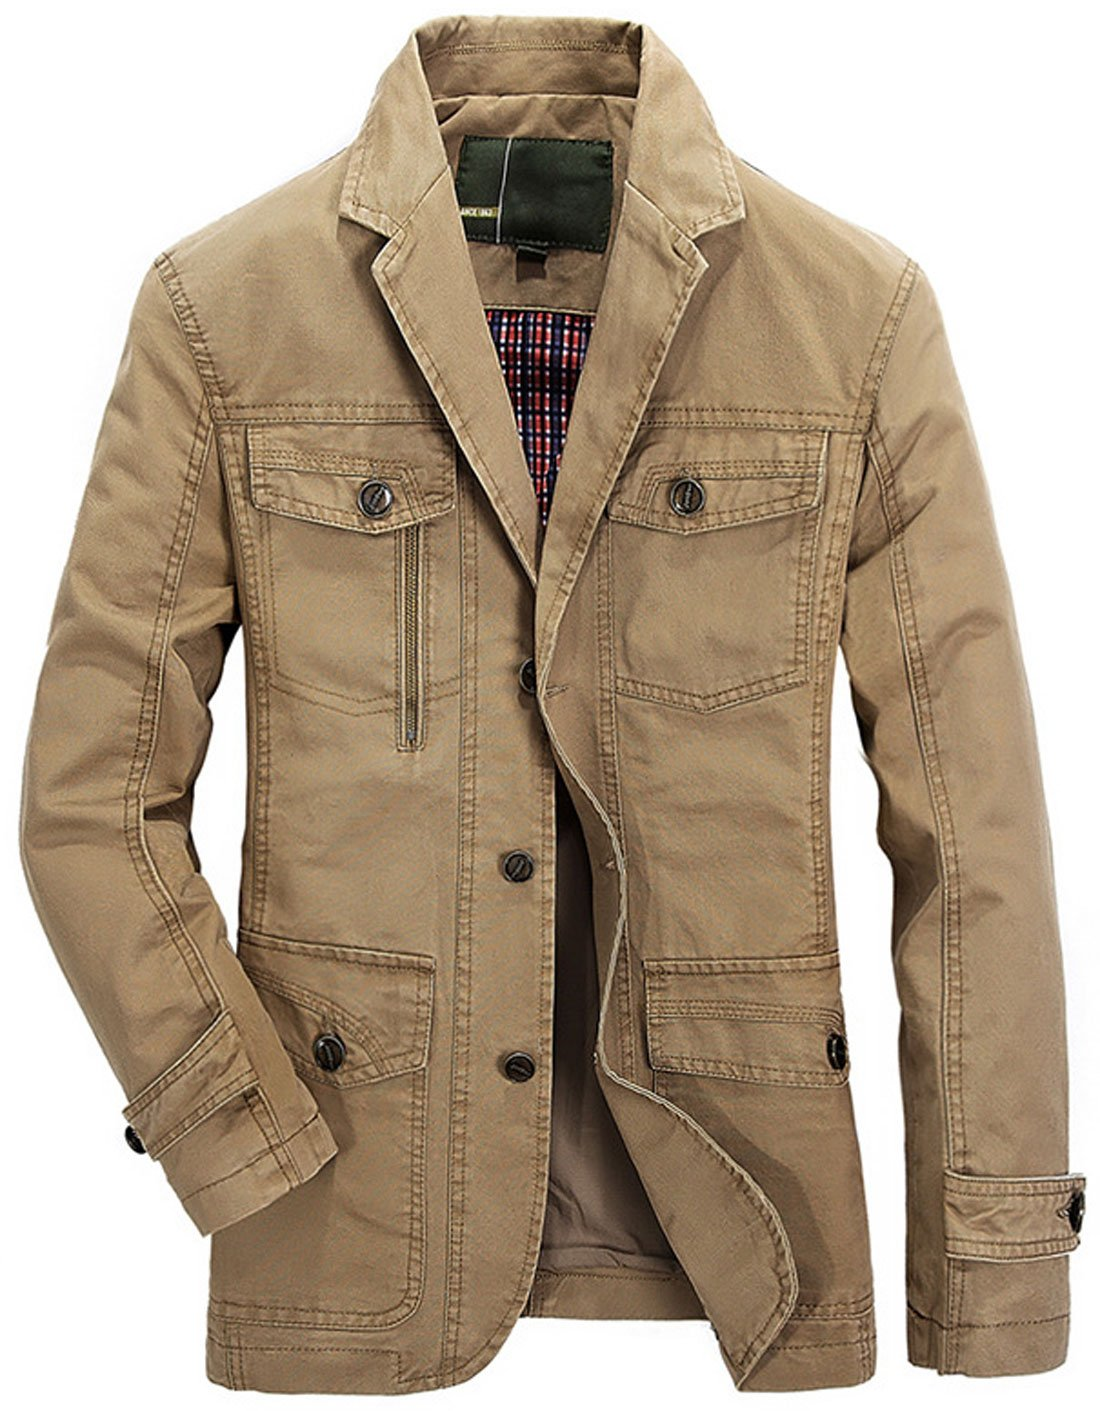 Chouyatou Men's Casual Notched Collar Multi Pockets 3 Buttons Lightweight Blazer Jackets (Large, Khaki) by Chouyatou